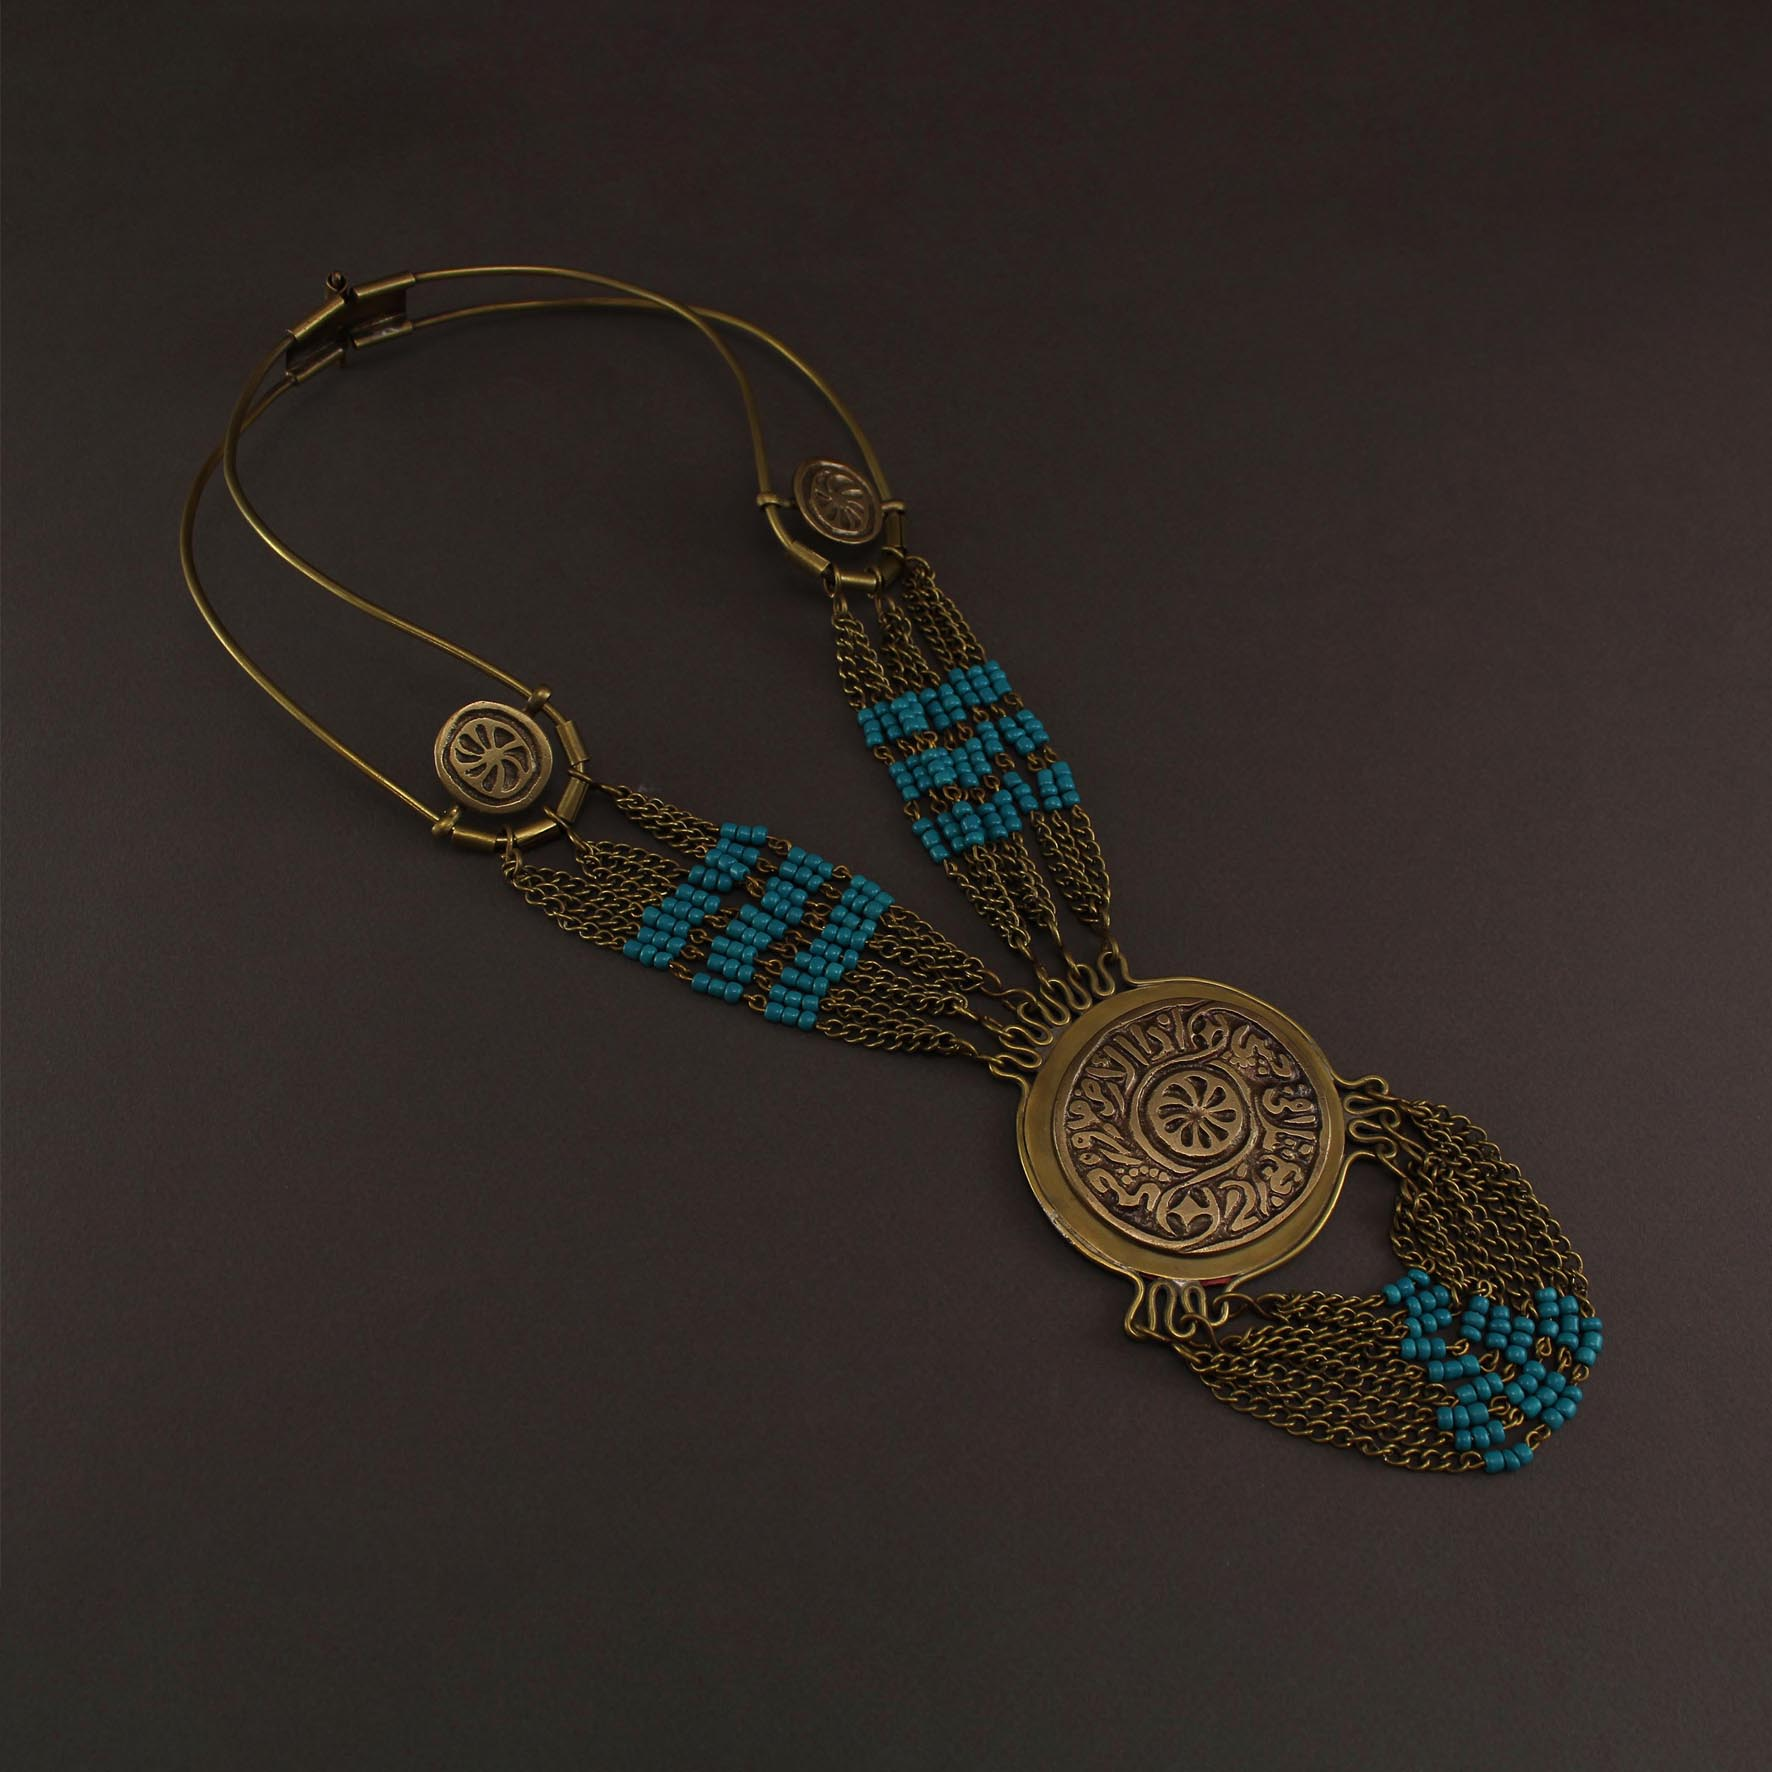 El-Ard Mdawarah Chains Collar